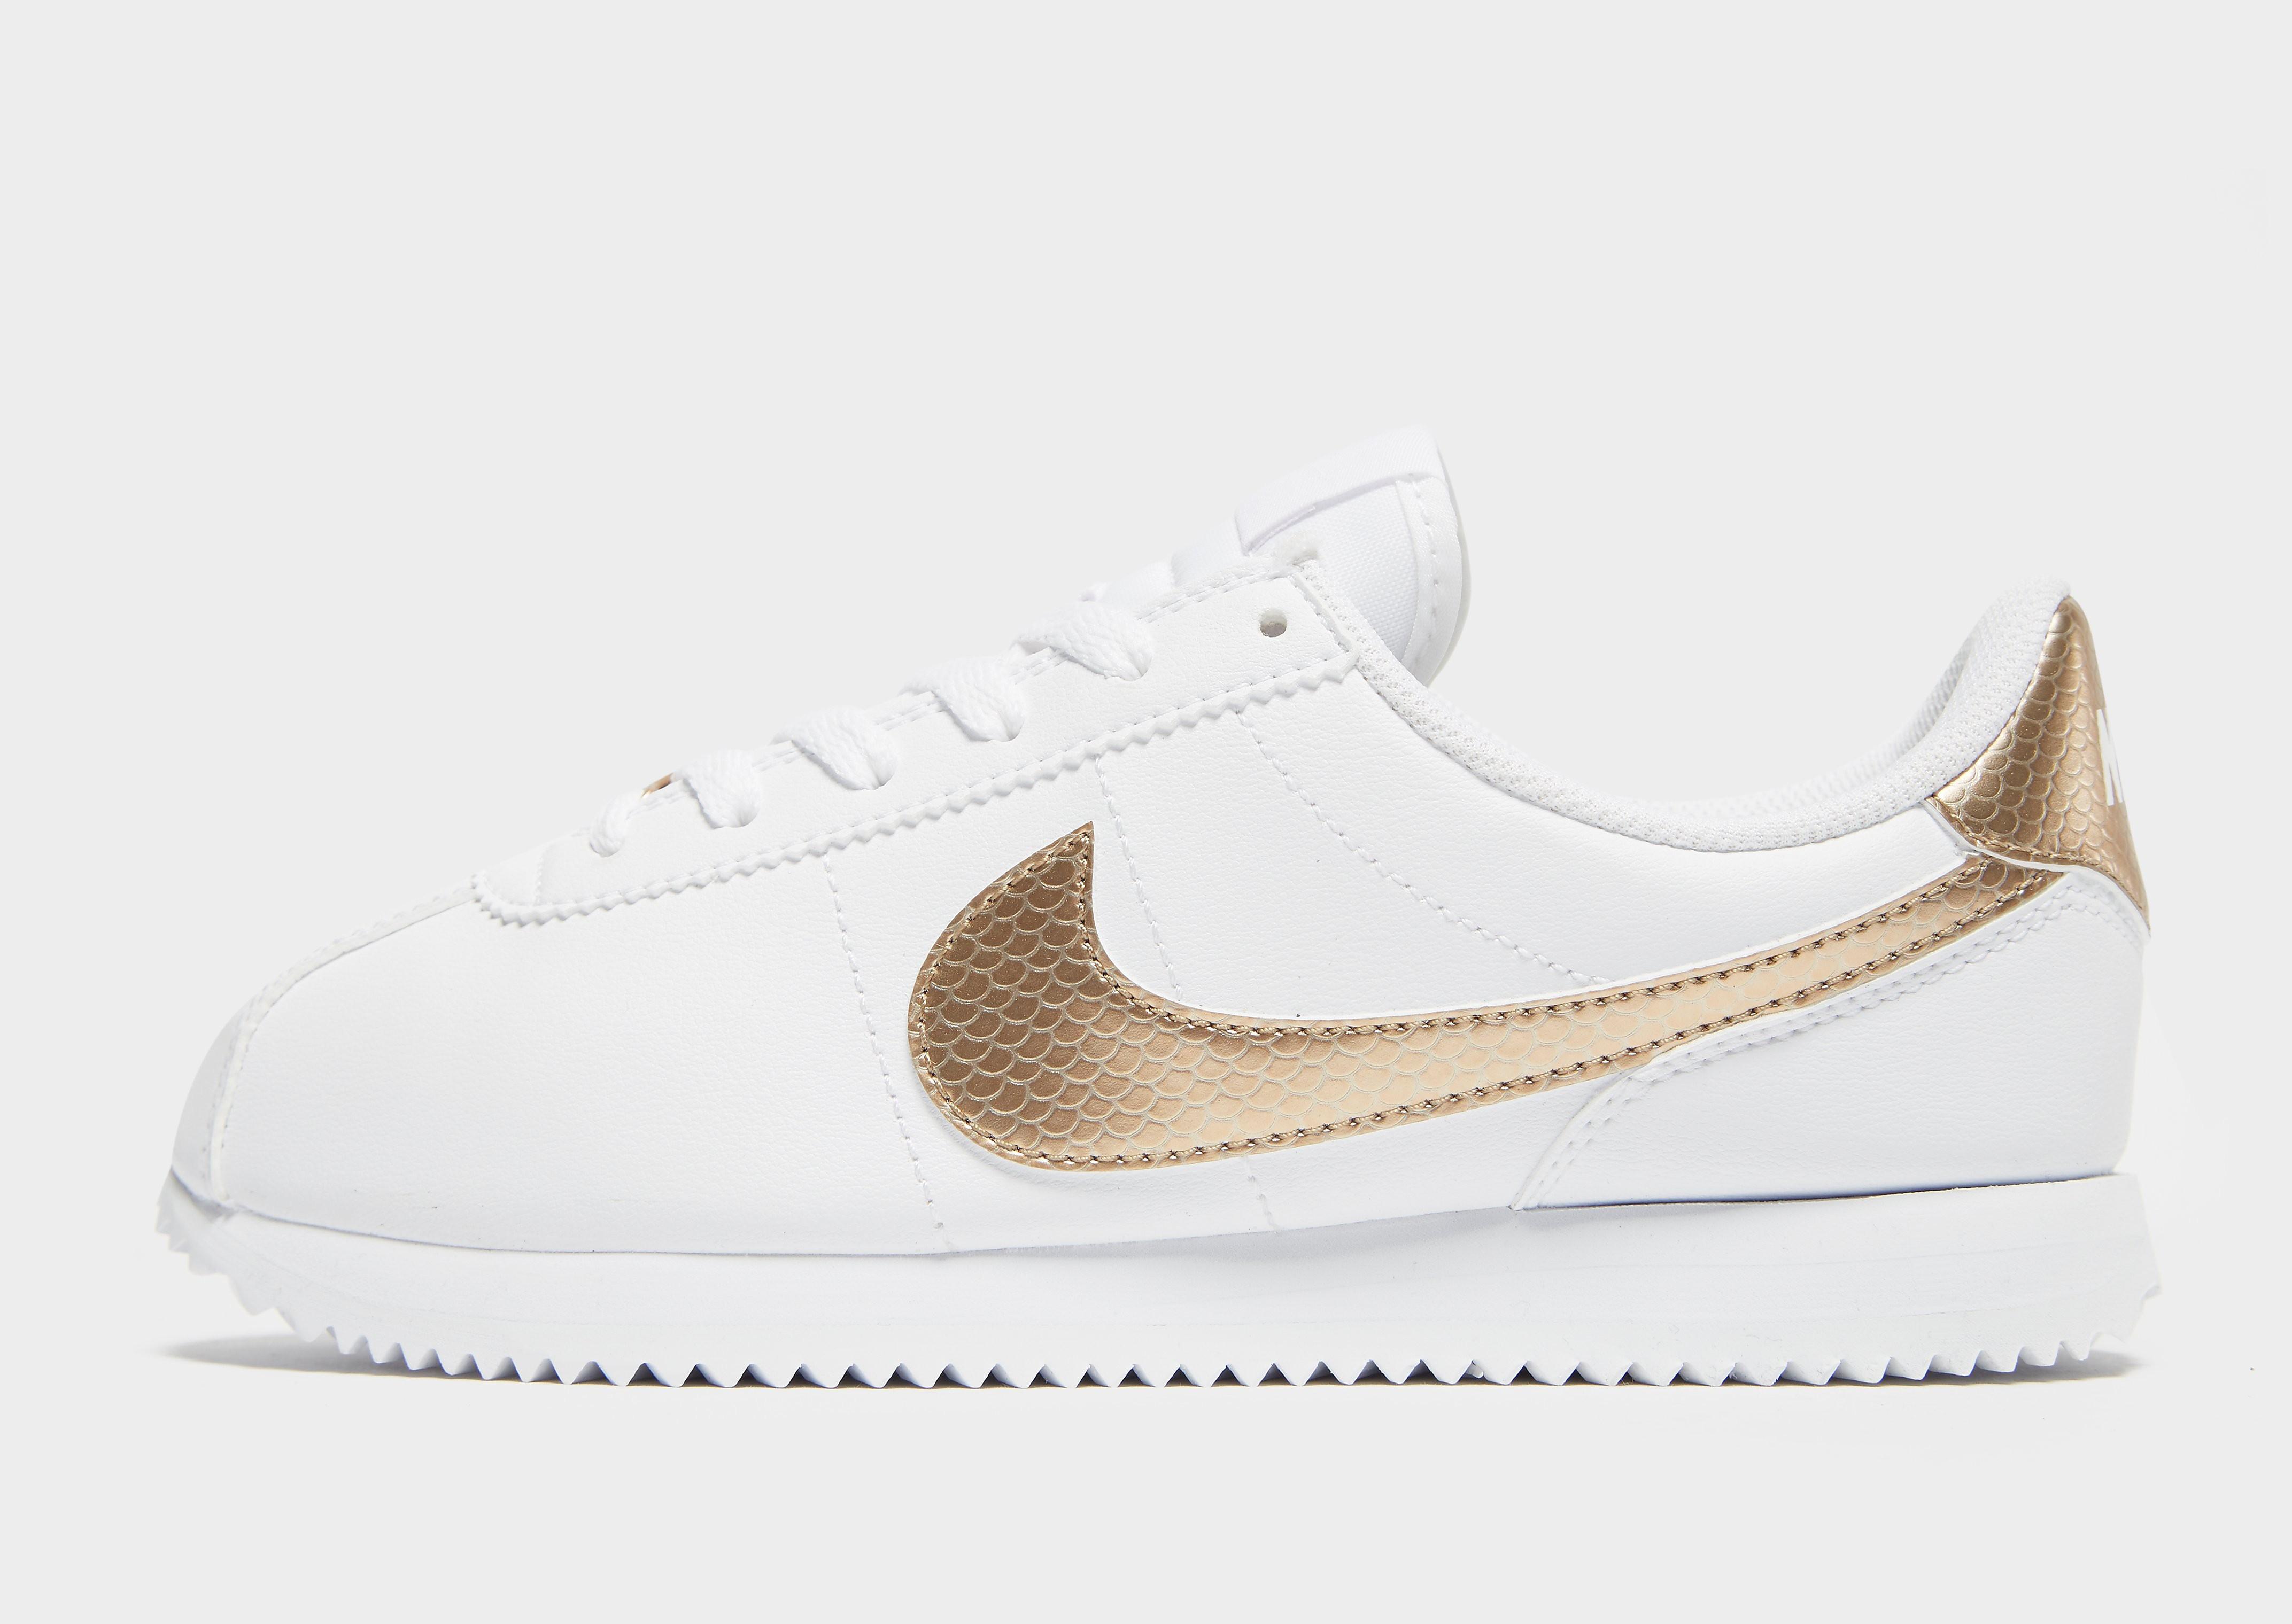 Nike Classic Cortez kindersneaker wit